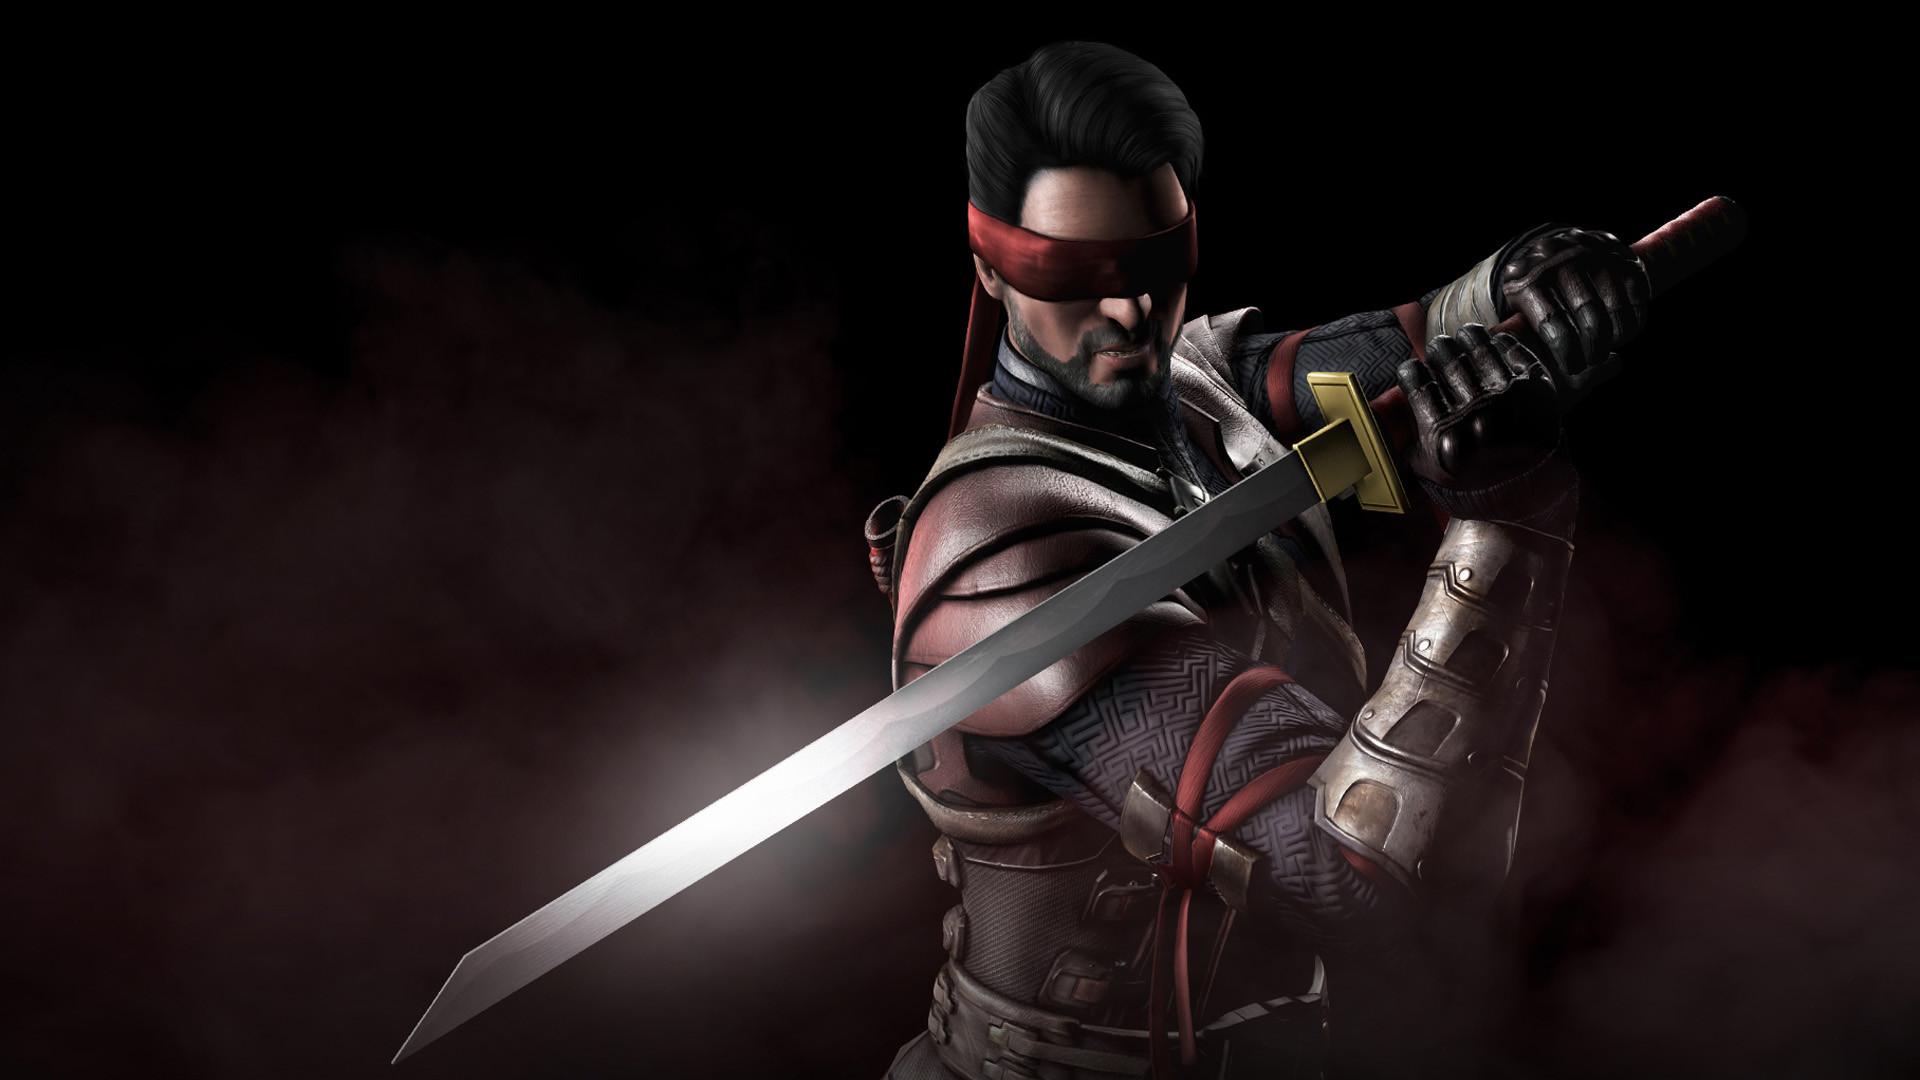 Mortal Kombat X Sword Man Wallpaper HD